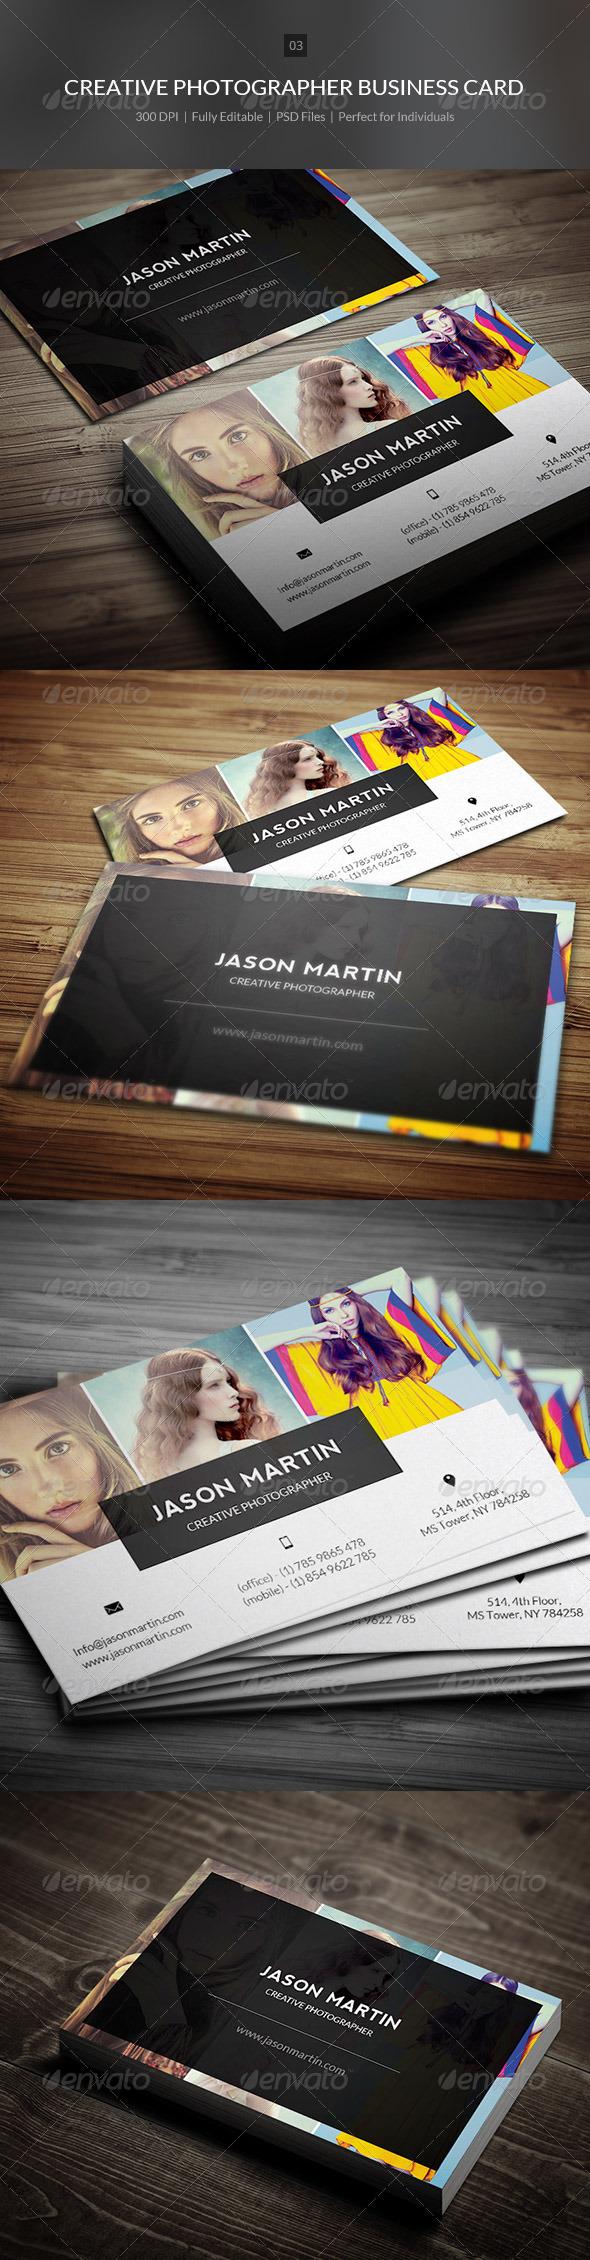 Creative Photographer Business Card - 03 - Creative Business Cards